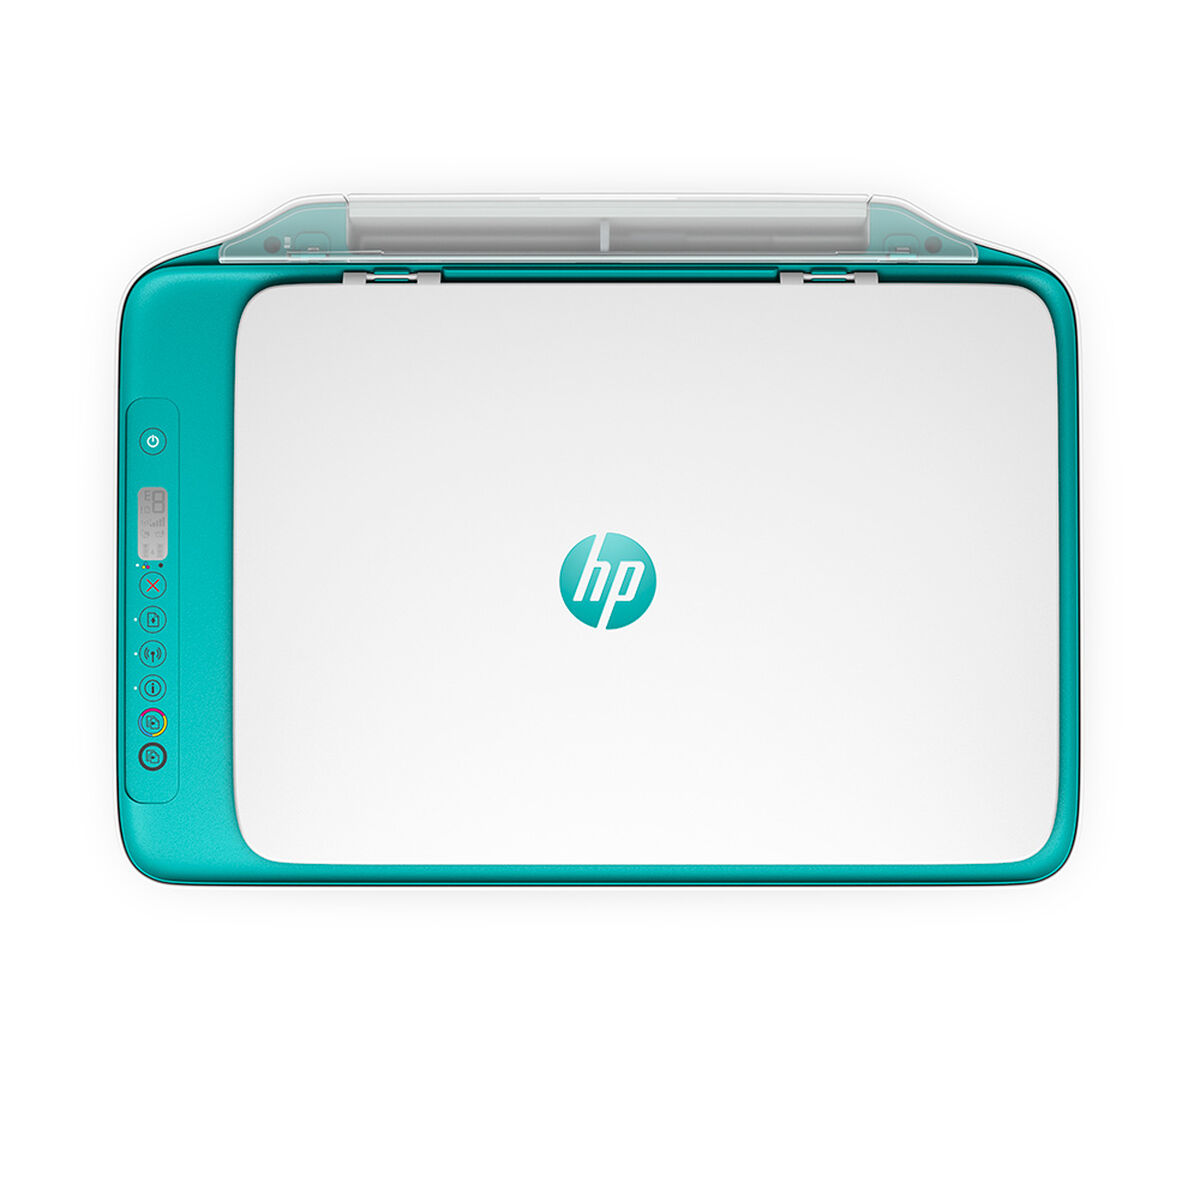 Multifuncional HP Deskjet IA 2675 WiFi